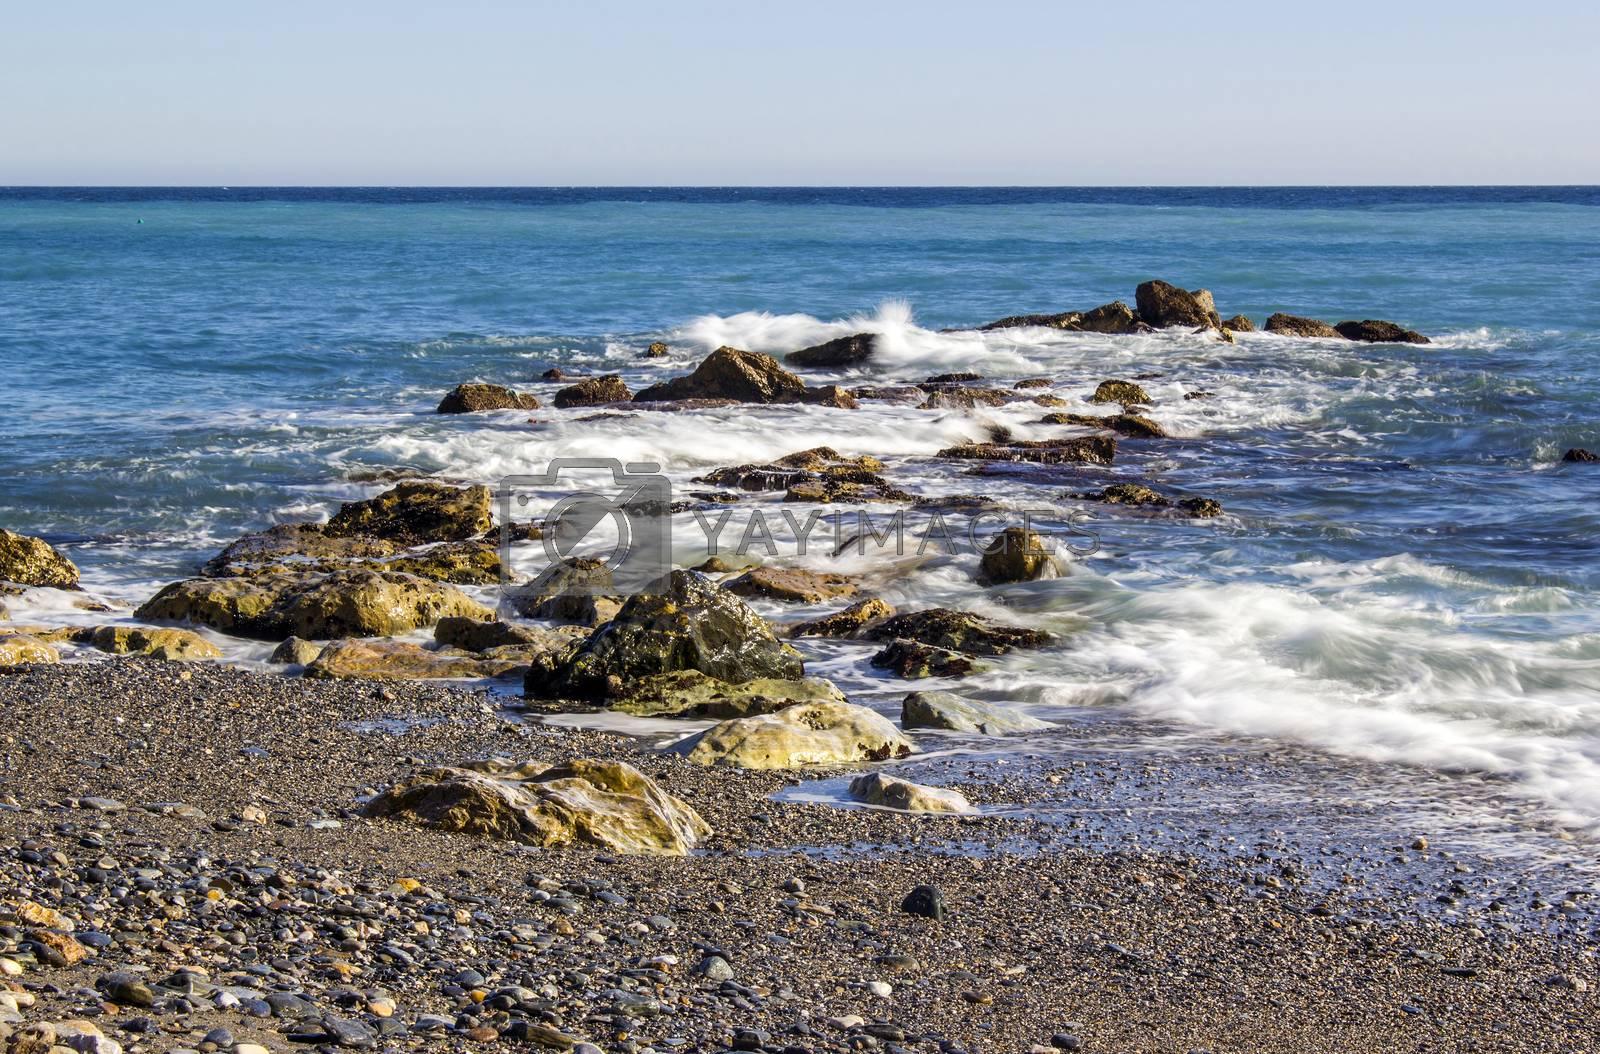 Stone beach in Almunecar, Andalusia, Spain